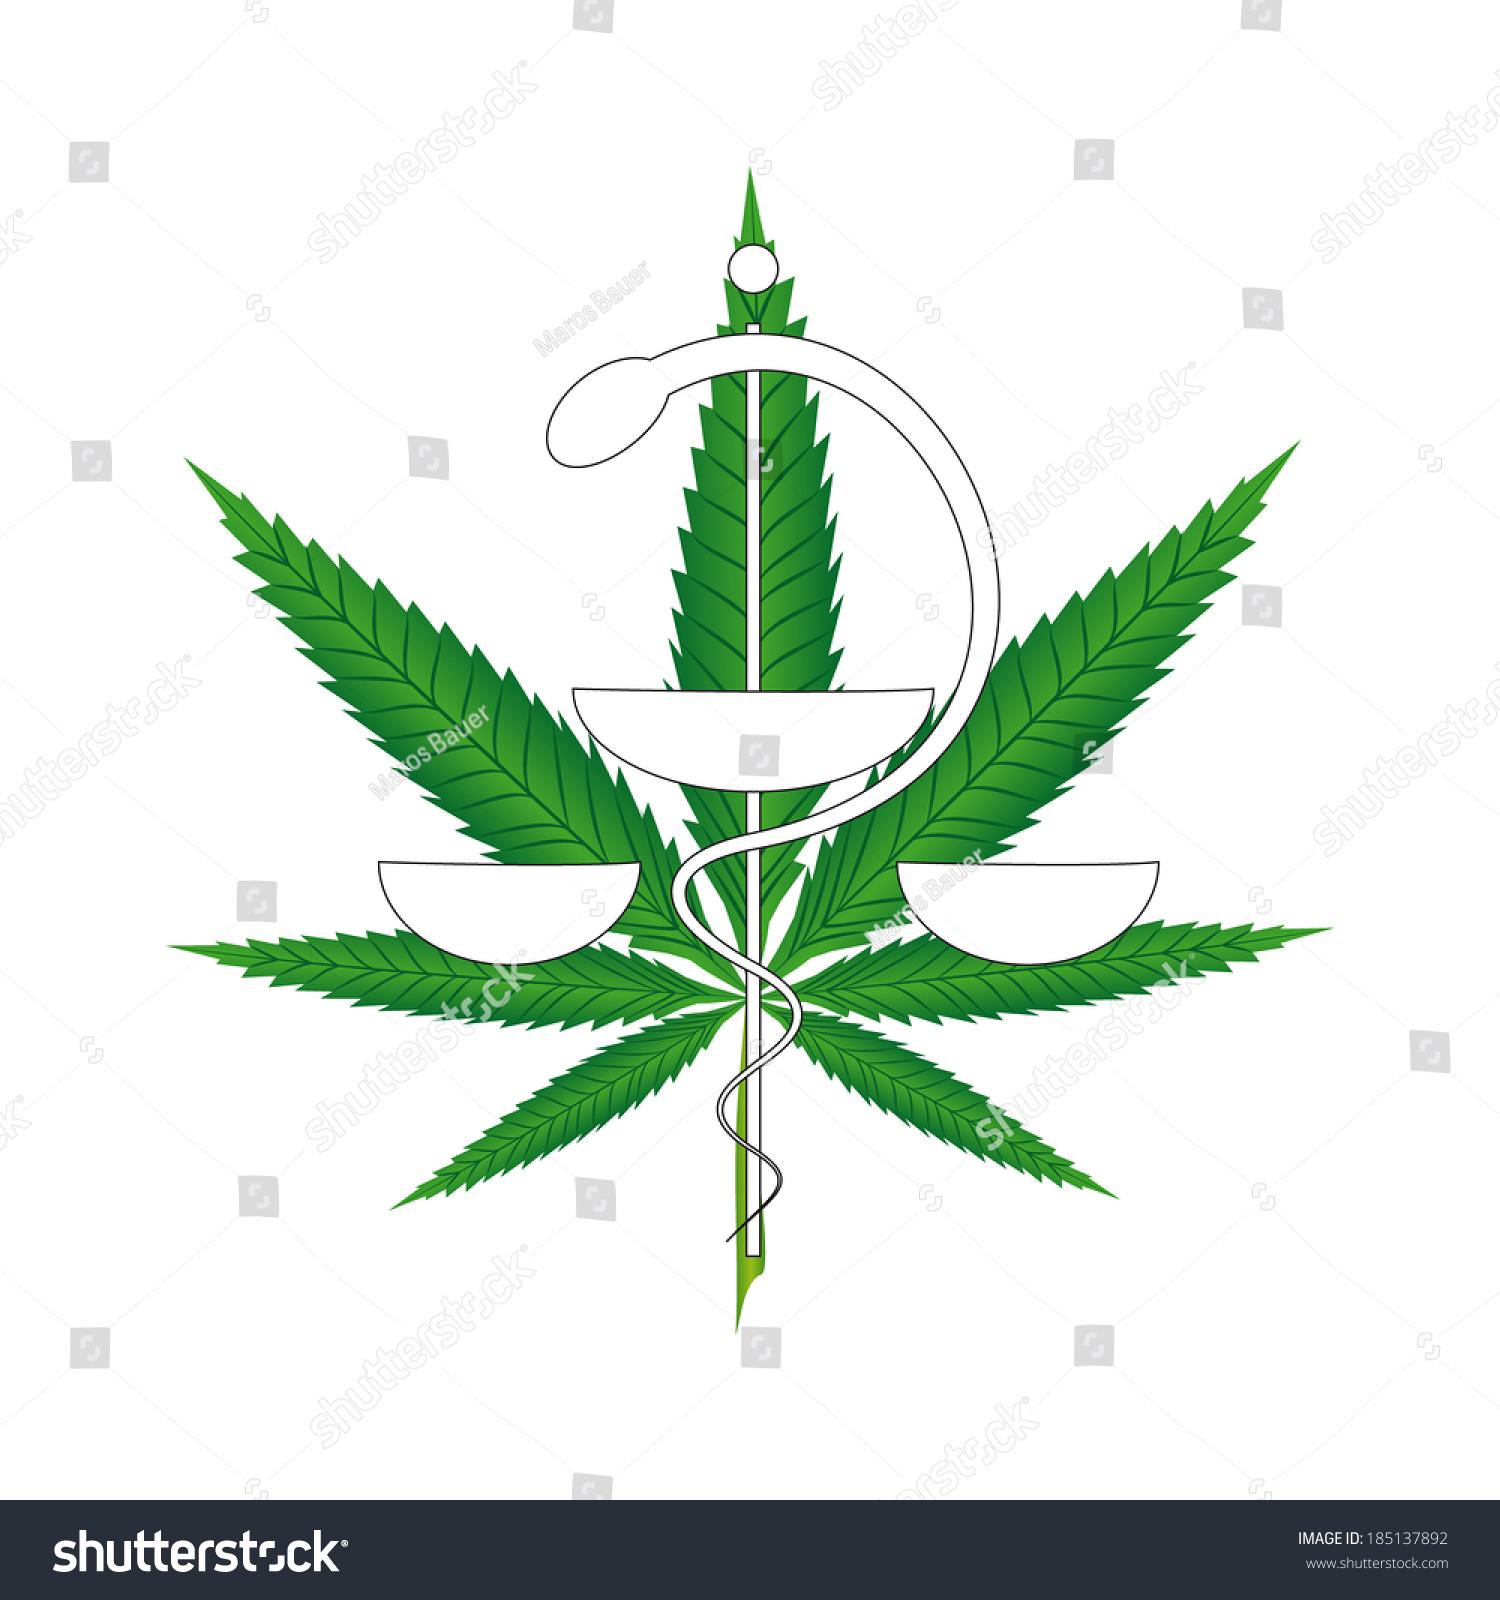 Snake in medical symbol image collections symbol and sign ideas illustration marijuana leaf foreground medical symbol stock vector illustration of marijuana leaf in the foreground with biocorpaavc Images